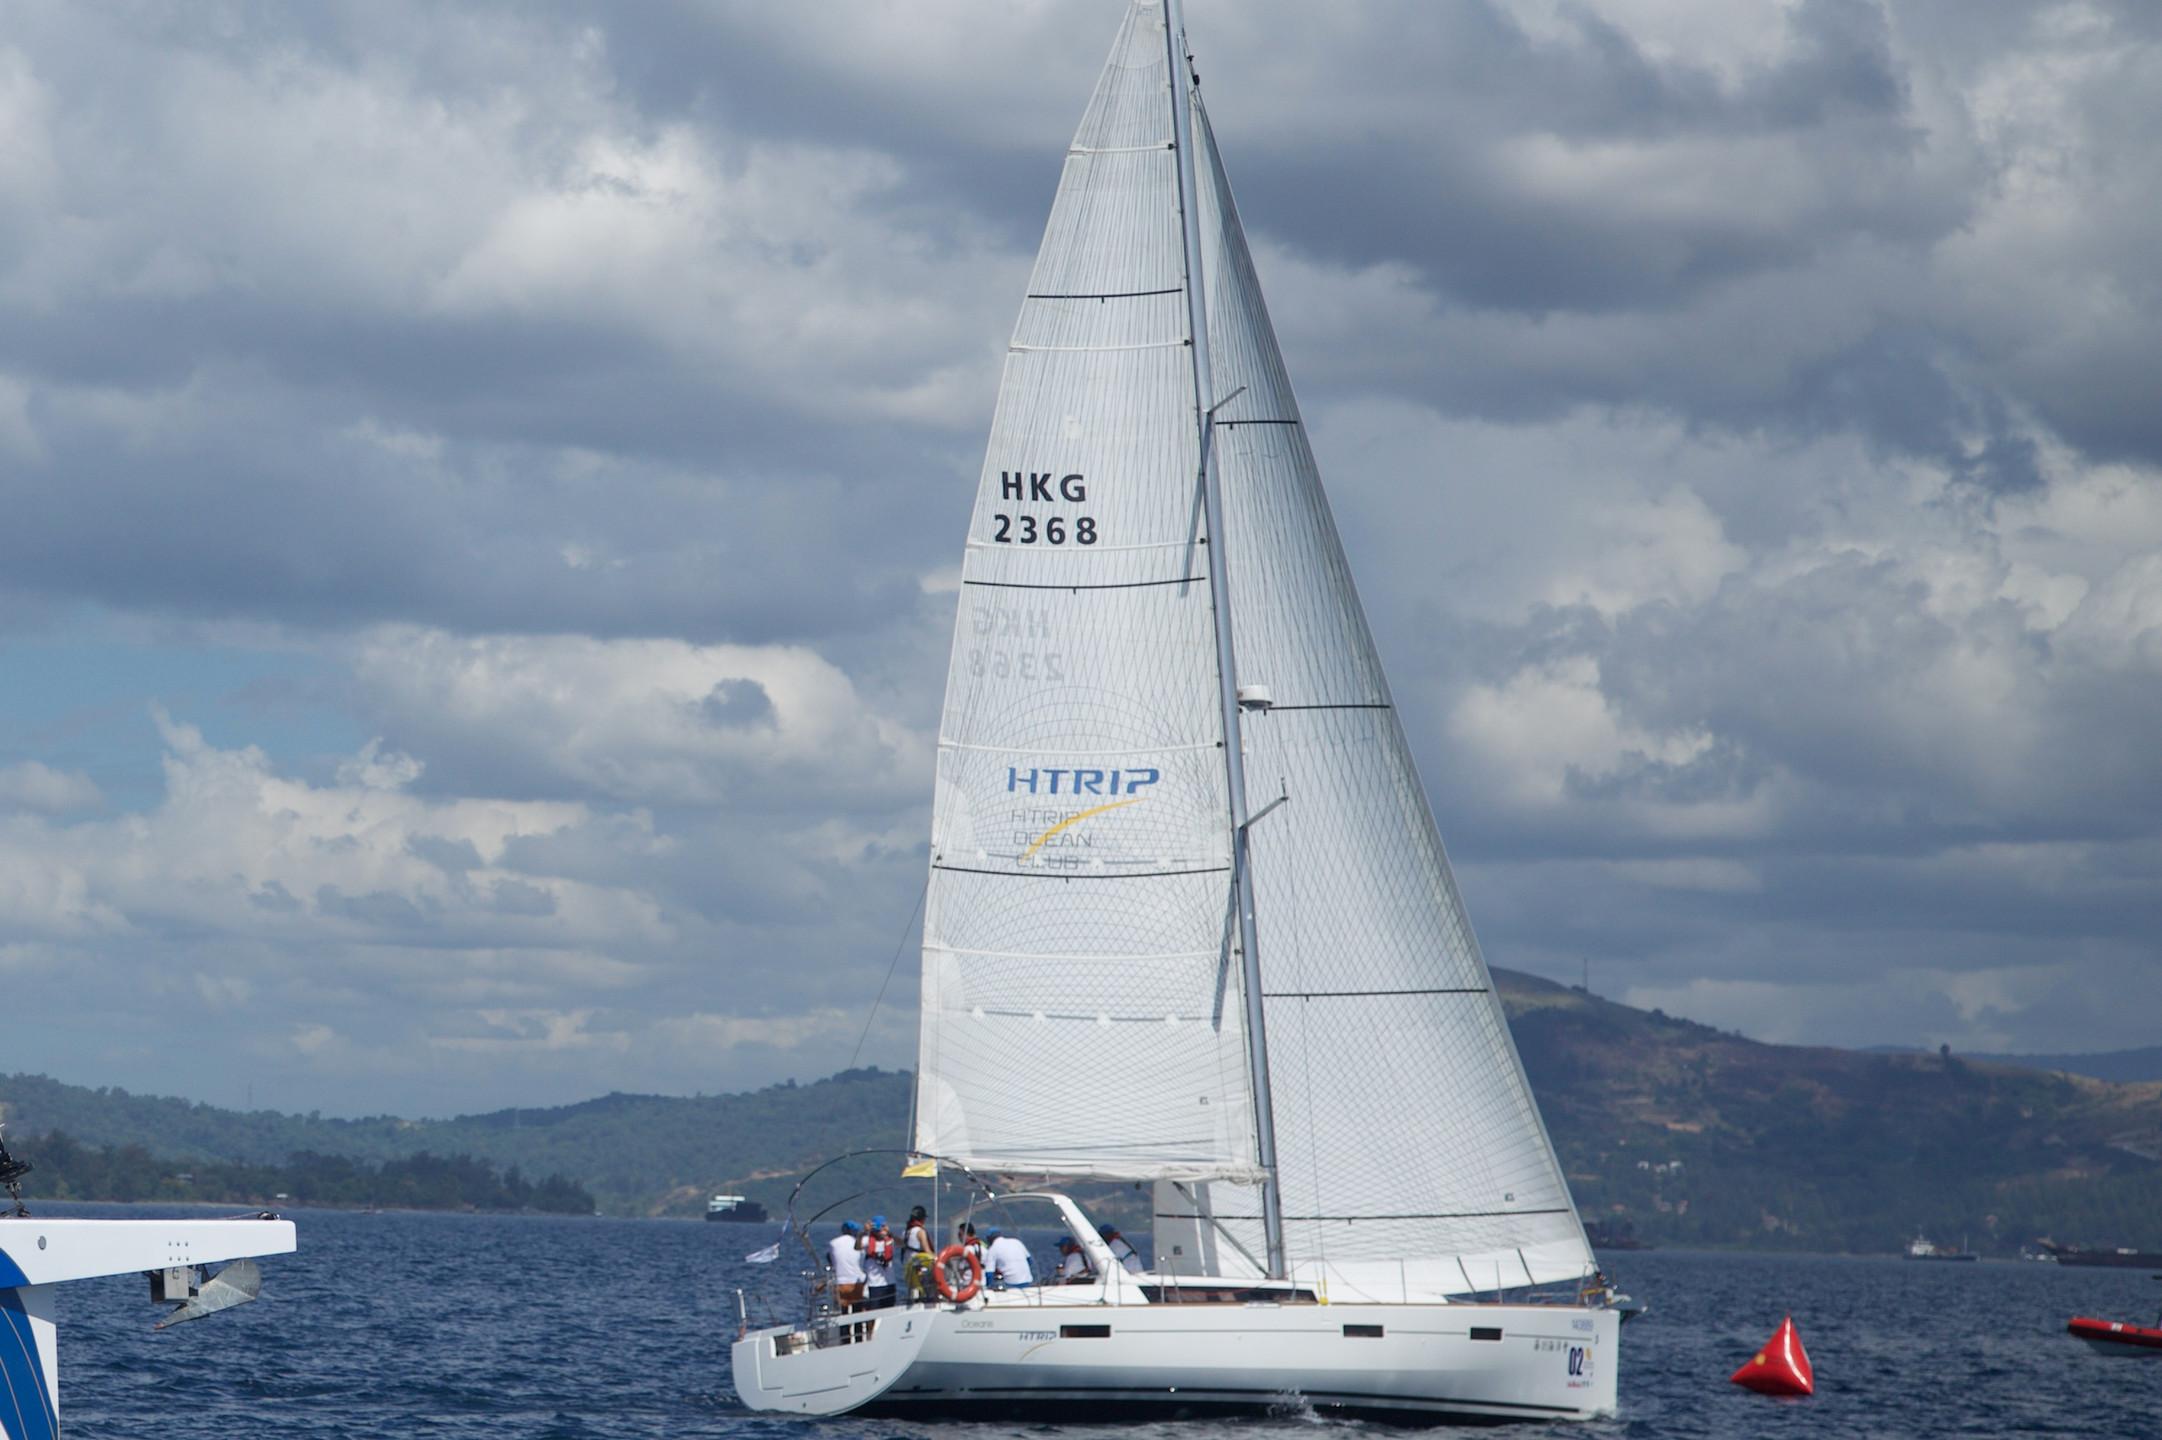 Asia Pacific Sailing Team